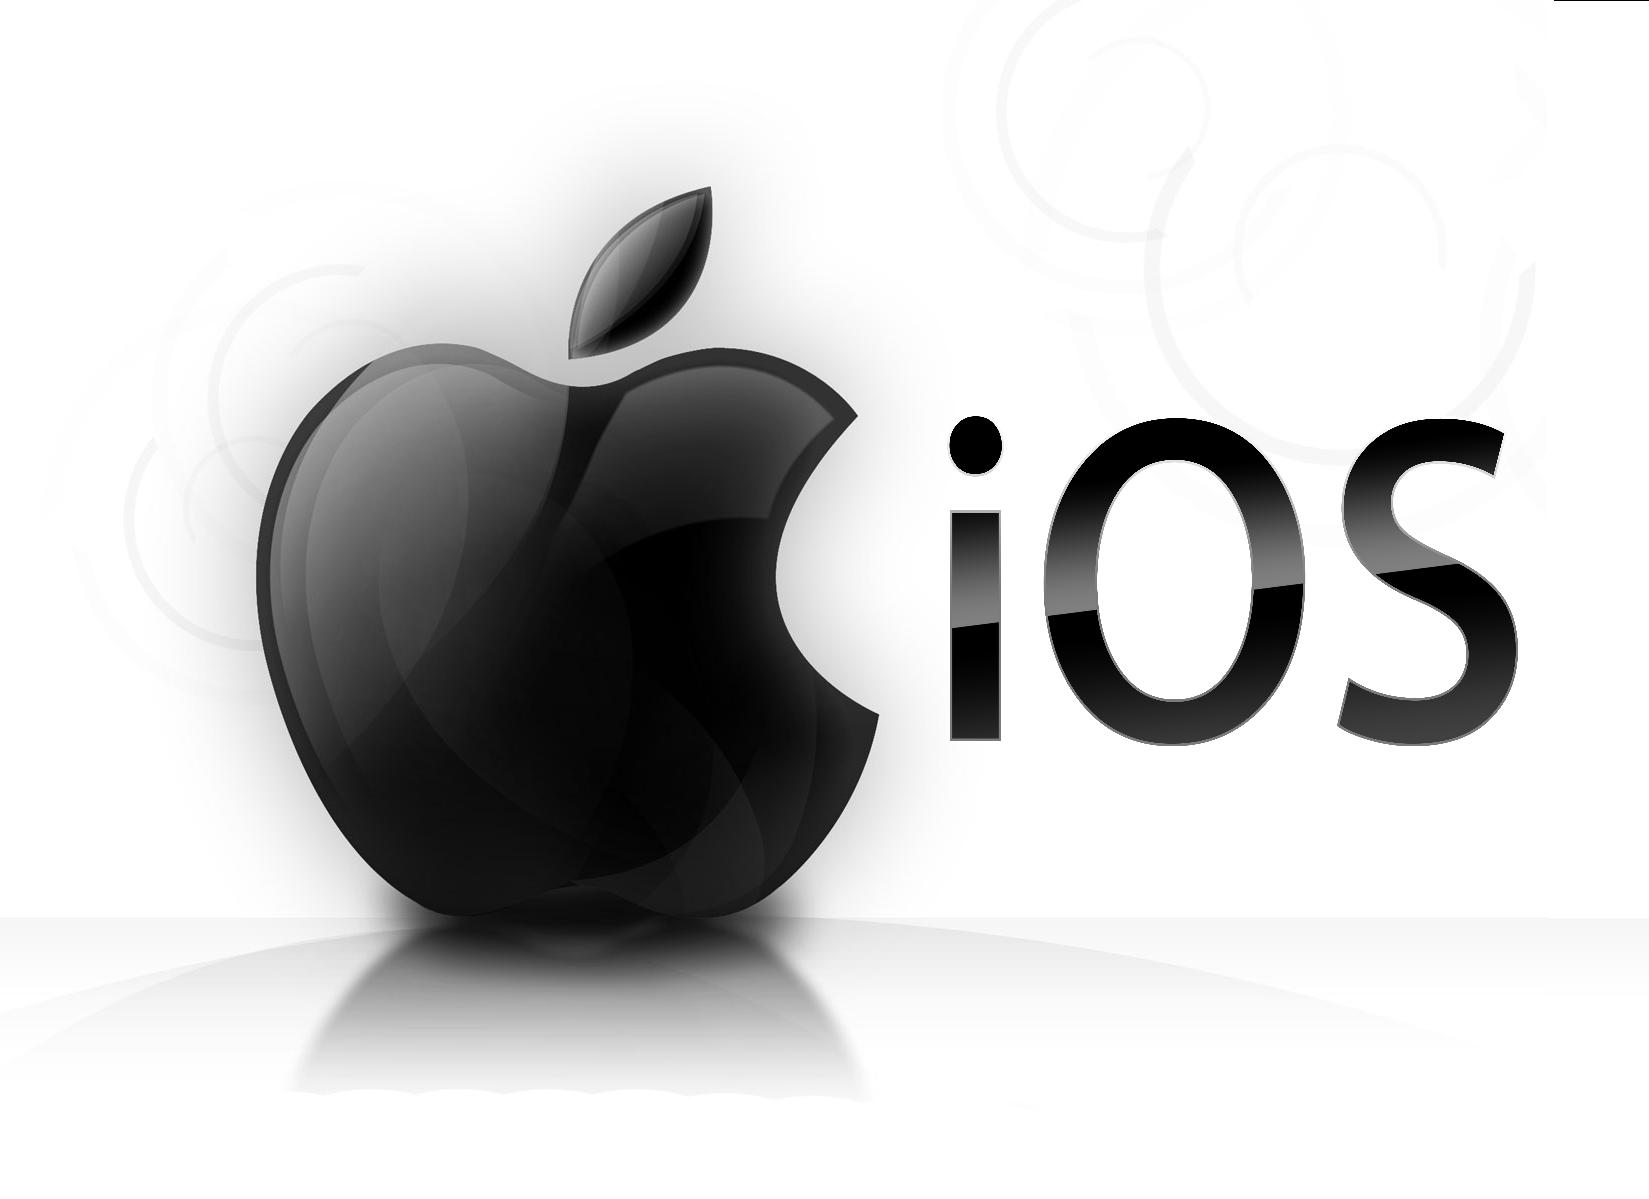 Apple Ios Logo PNG - 31885